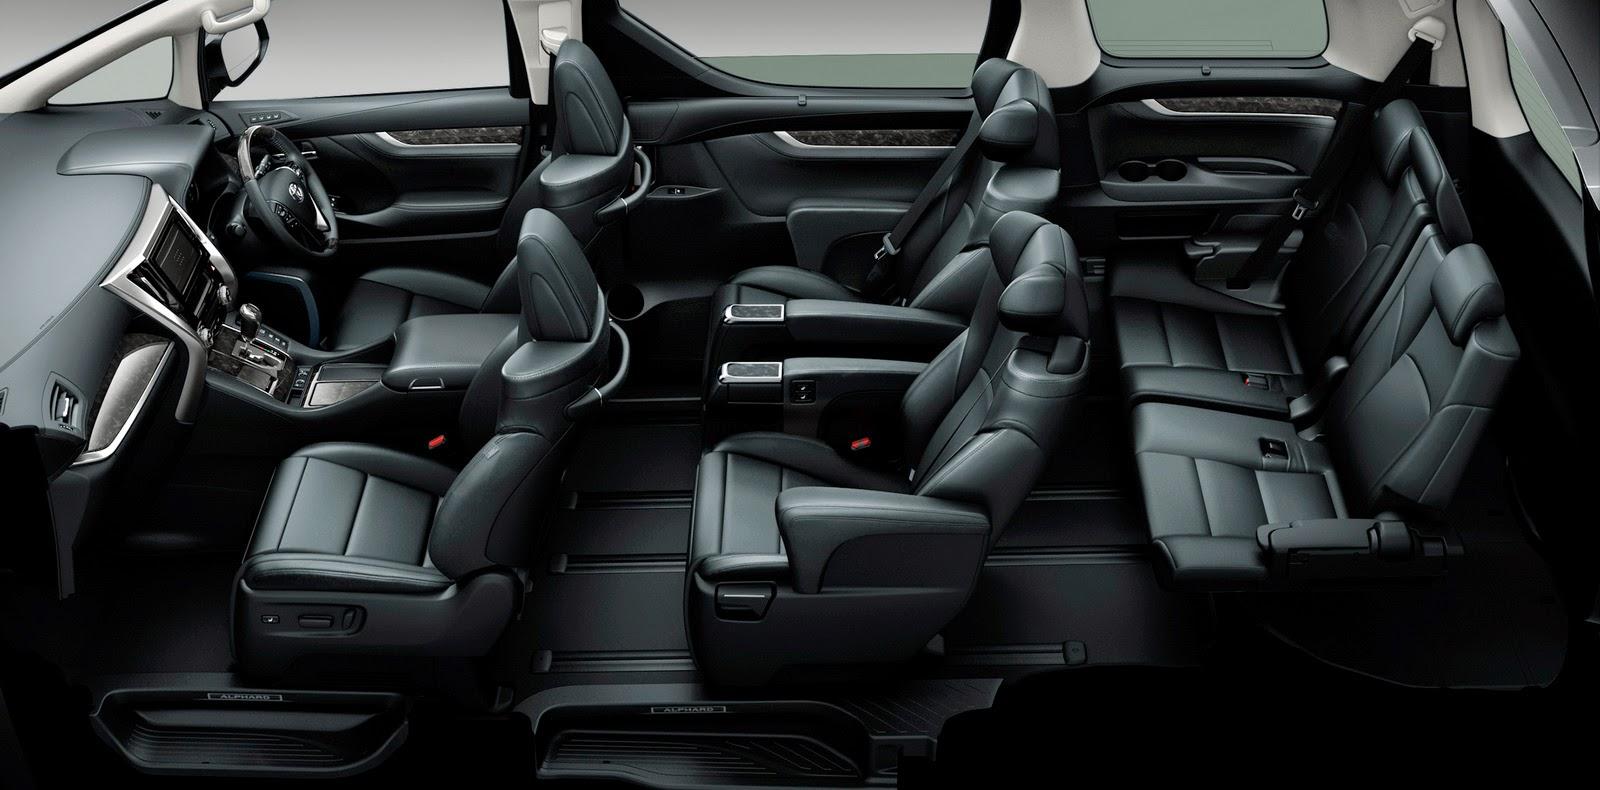 All New Alphard Hybrid Grand Avanza Vs Great Xenia Car News Update เปดตว Toyota Vellfire